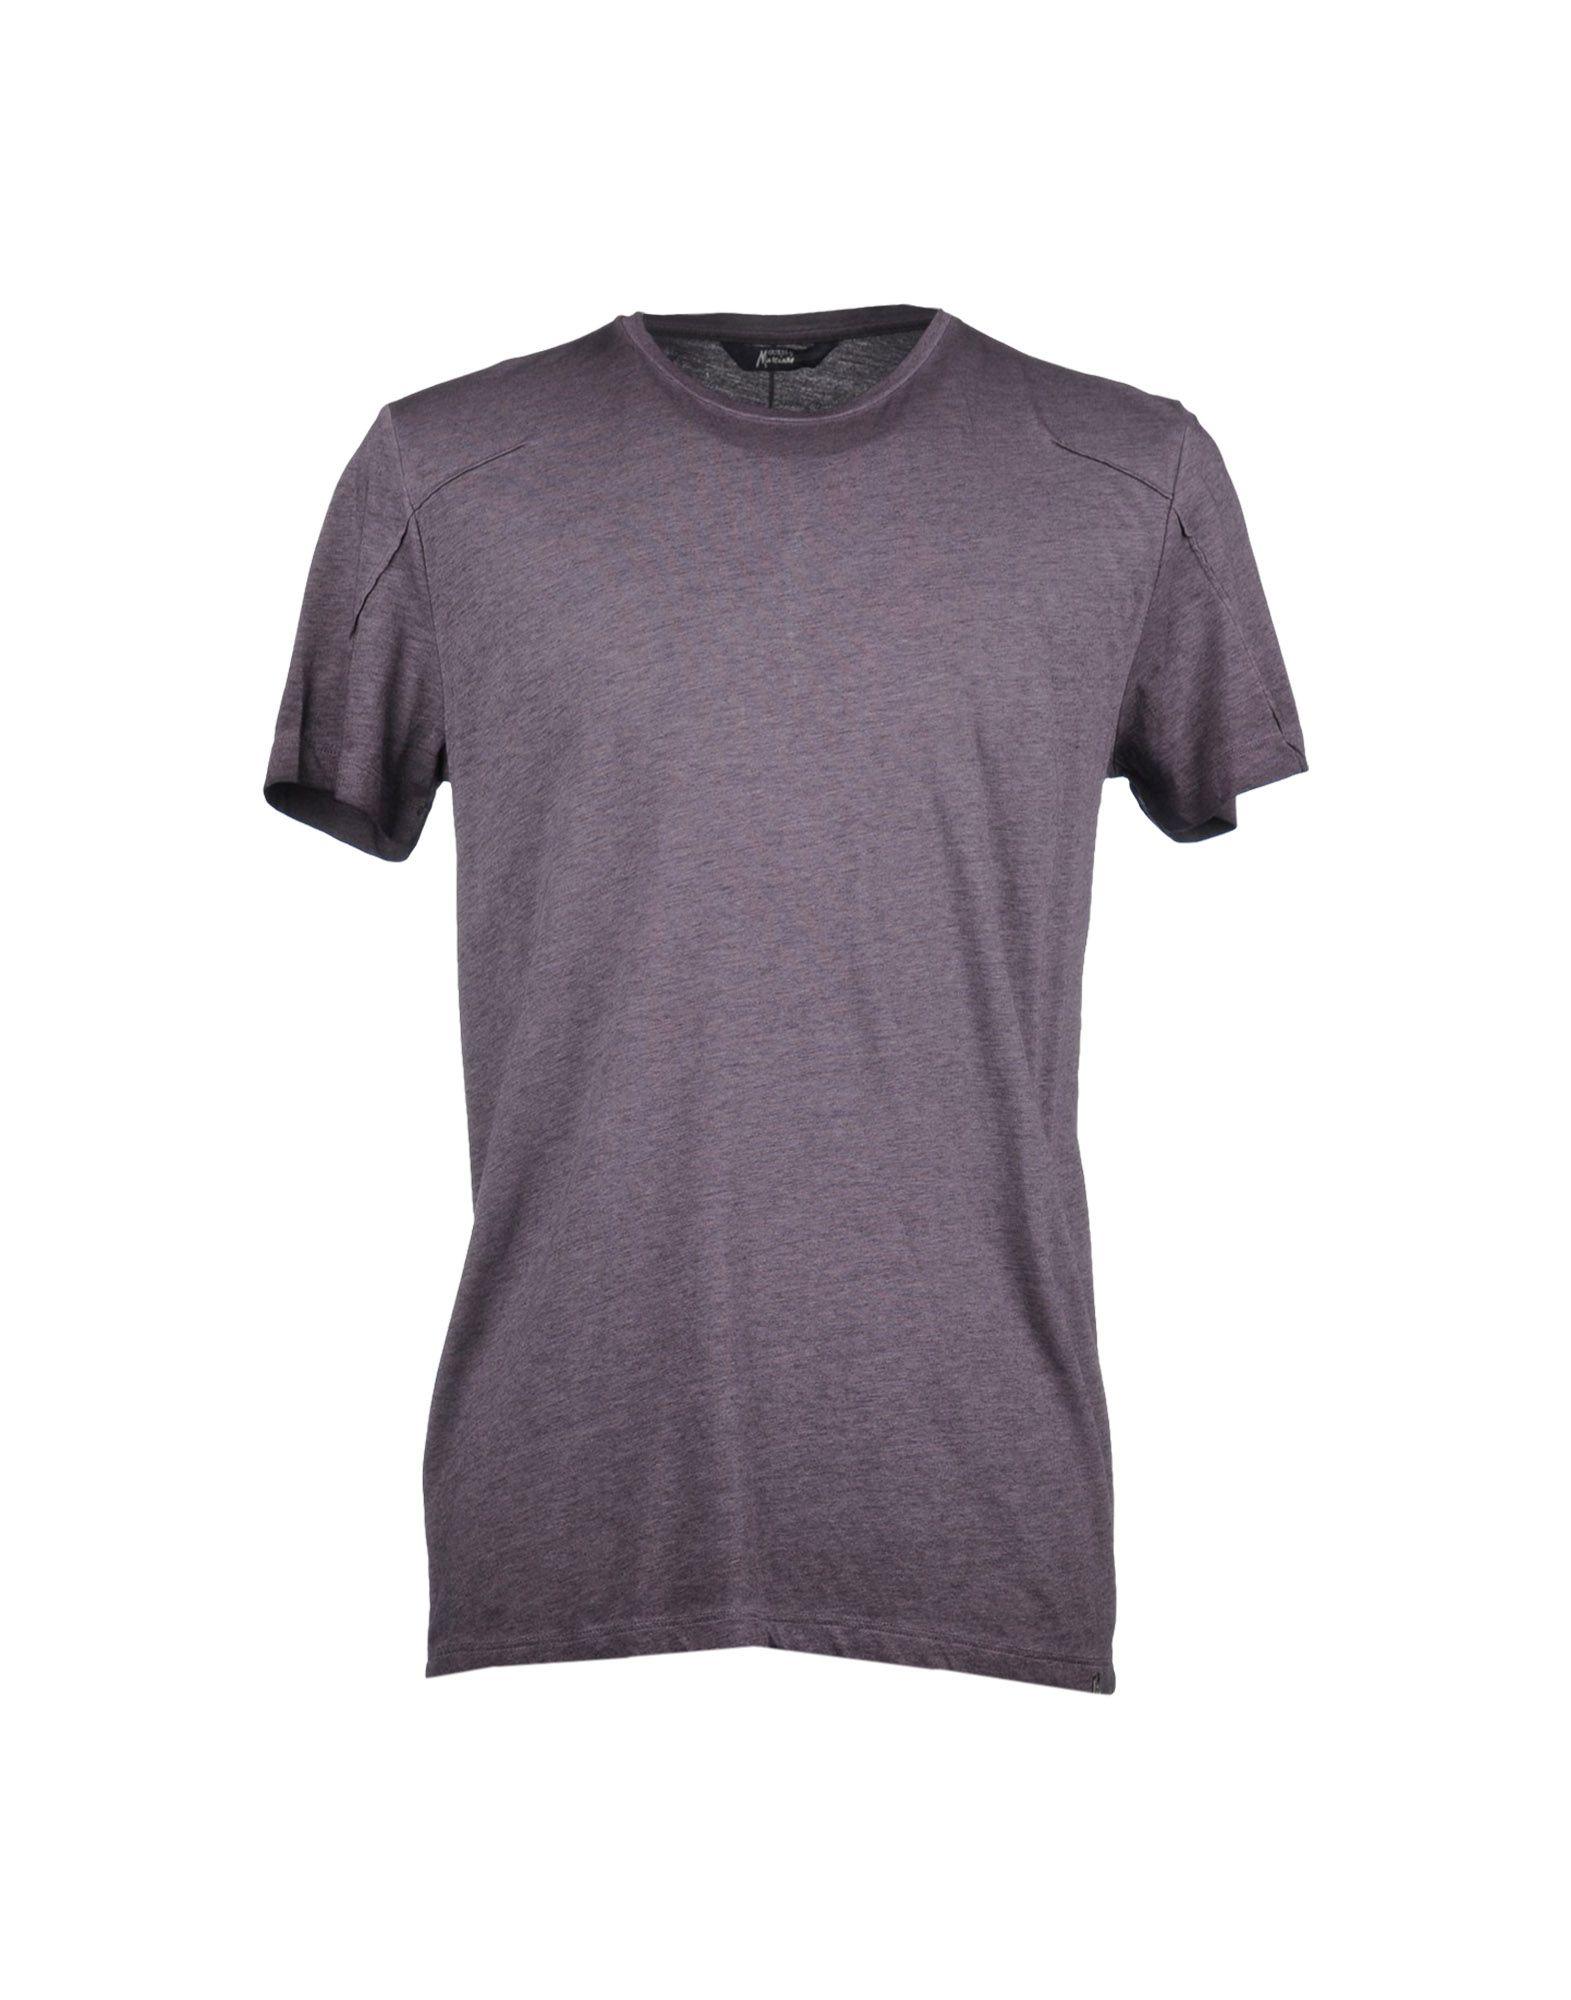 guess short sleeve t shirt in brown for men light brown. Black Bedroom Furniture Sets. Home Design Ideas